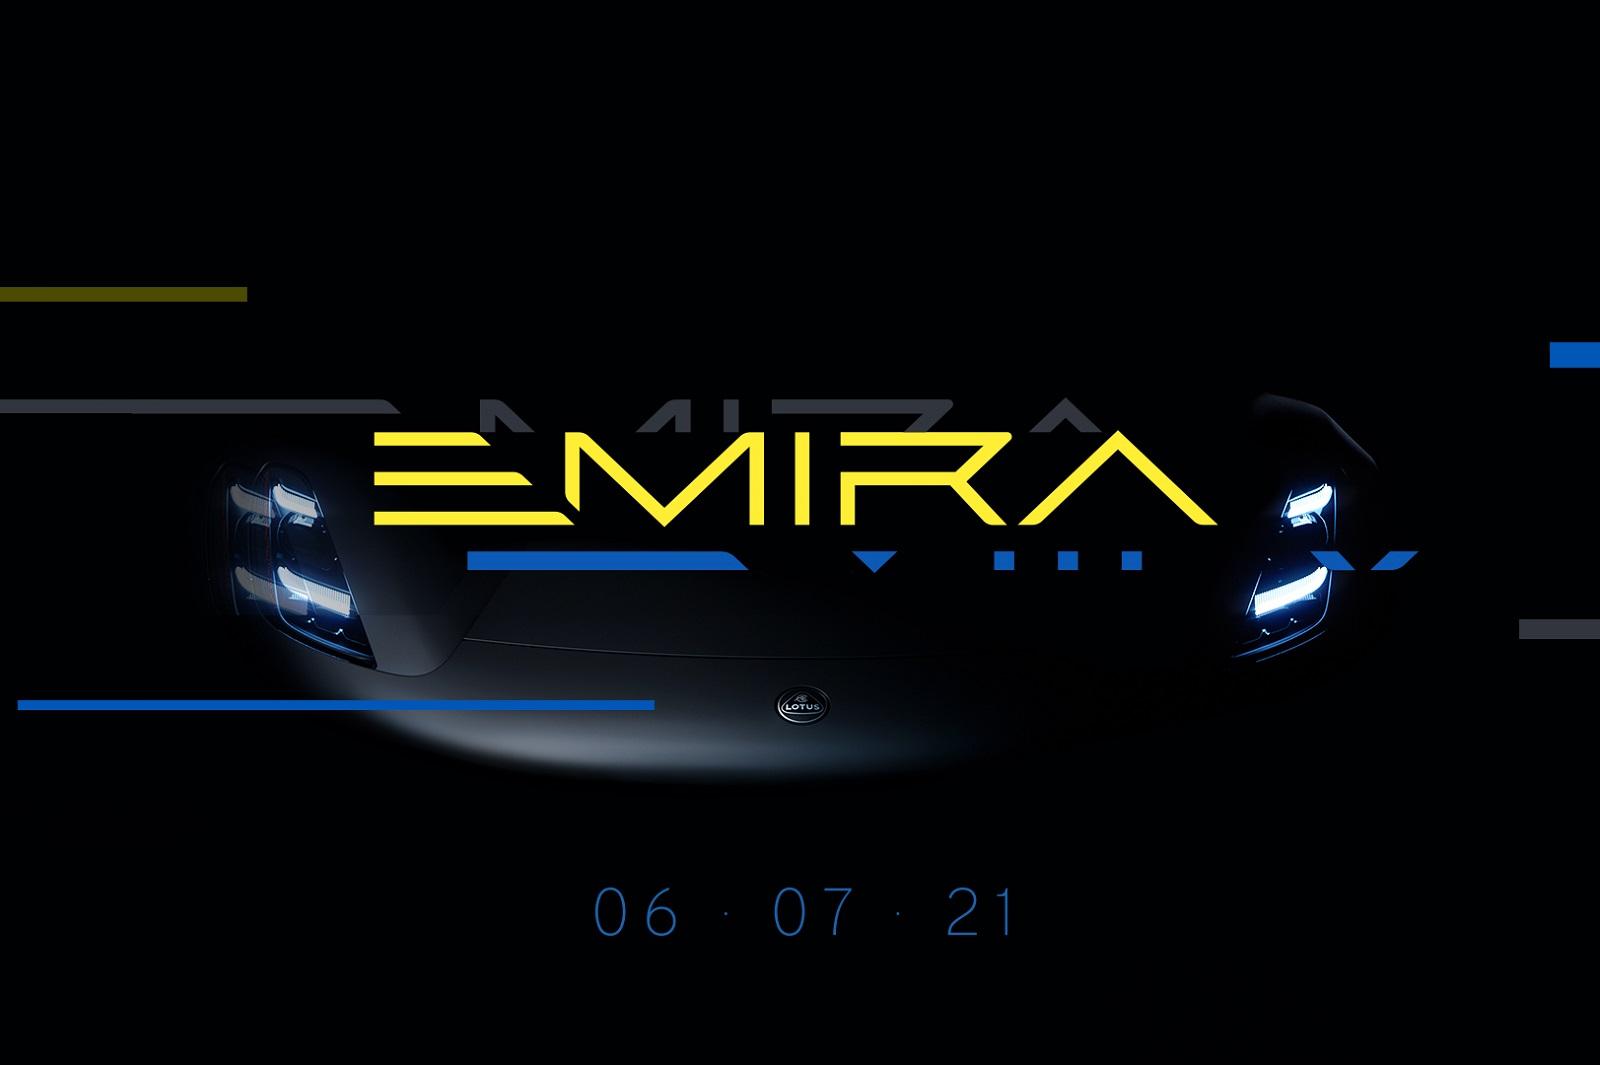 Emira-Launch-Date (1)